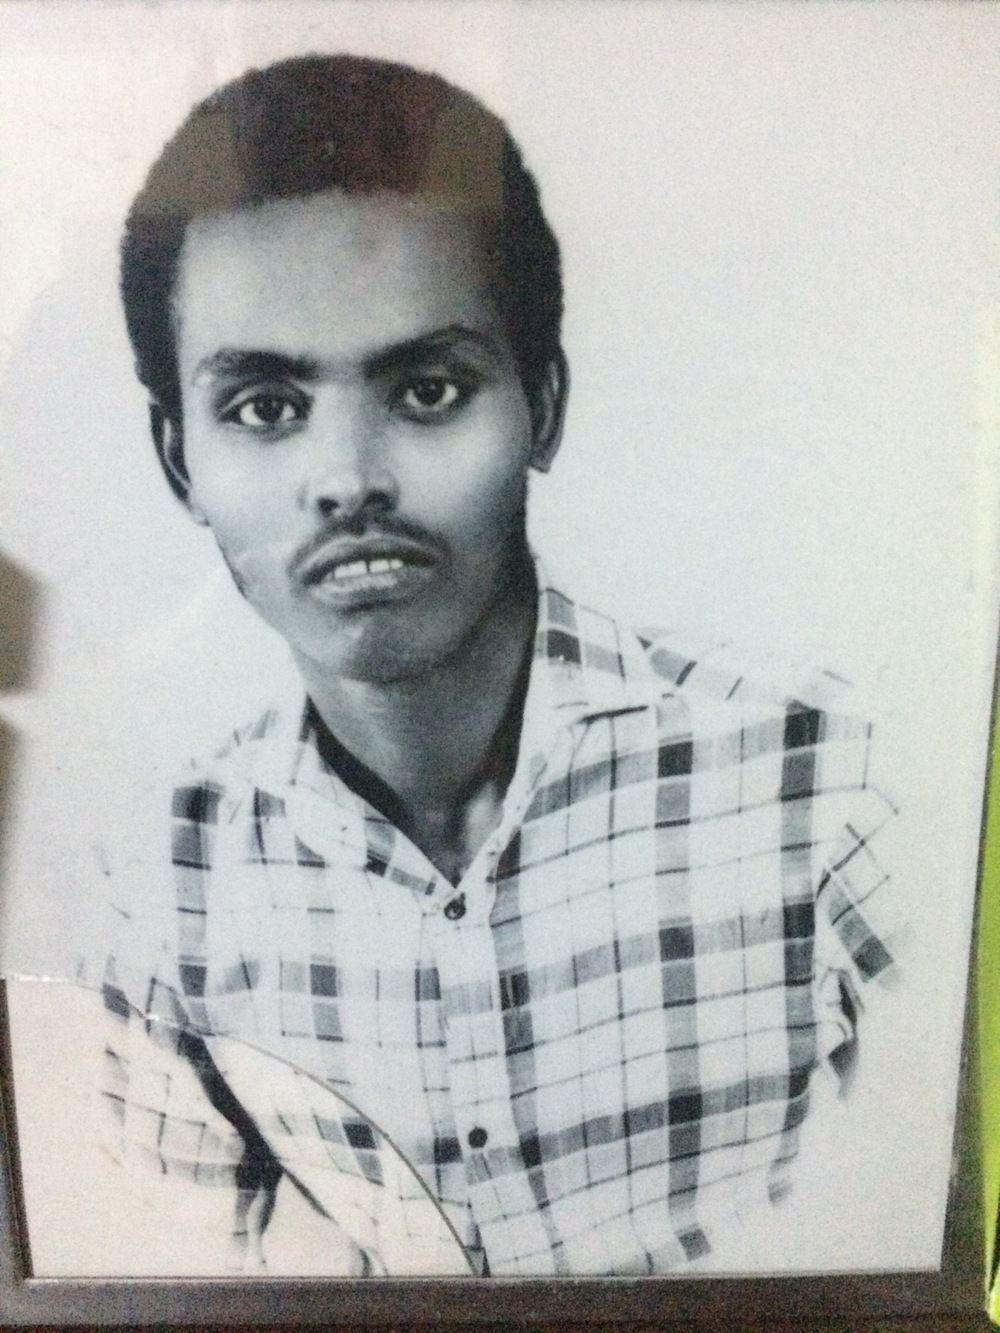 Tarzan in Mogadishu, aged about 20.